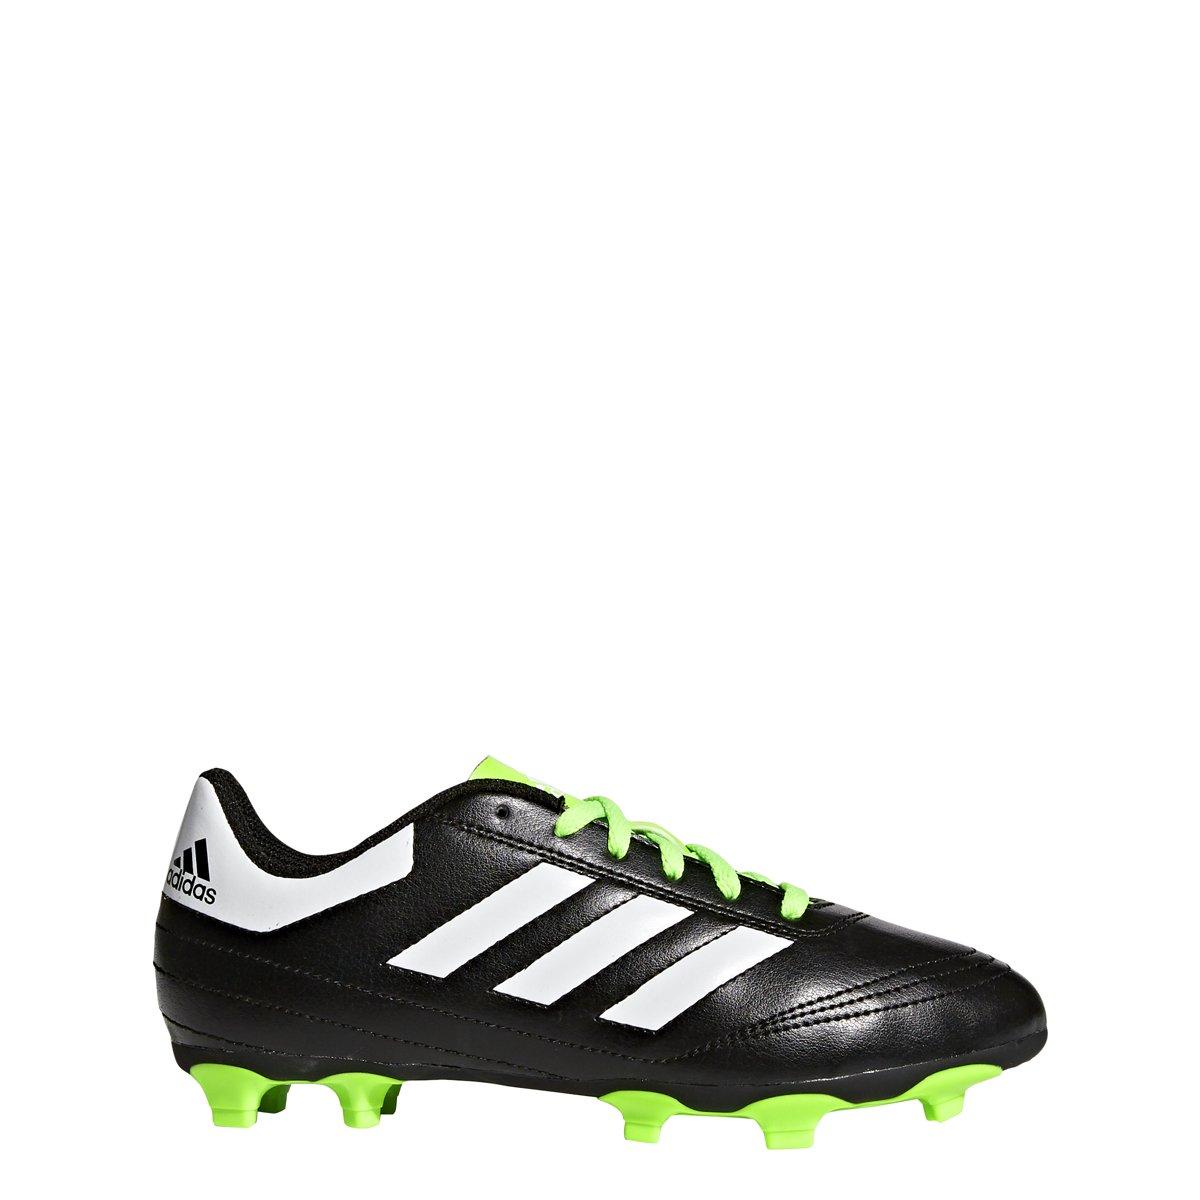 adidas Performance Kids' Goletto VI J Firm Ground Soccer Cleats, Black/White/Sgreen, 2 Medium US Little Kid